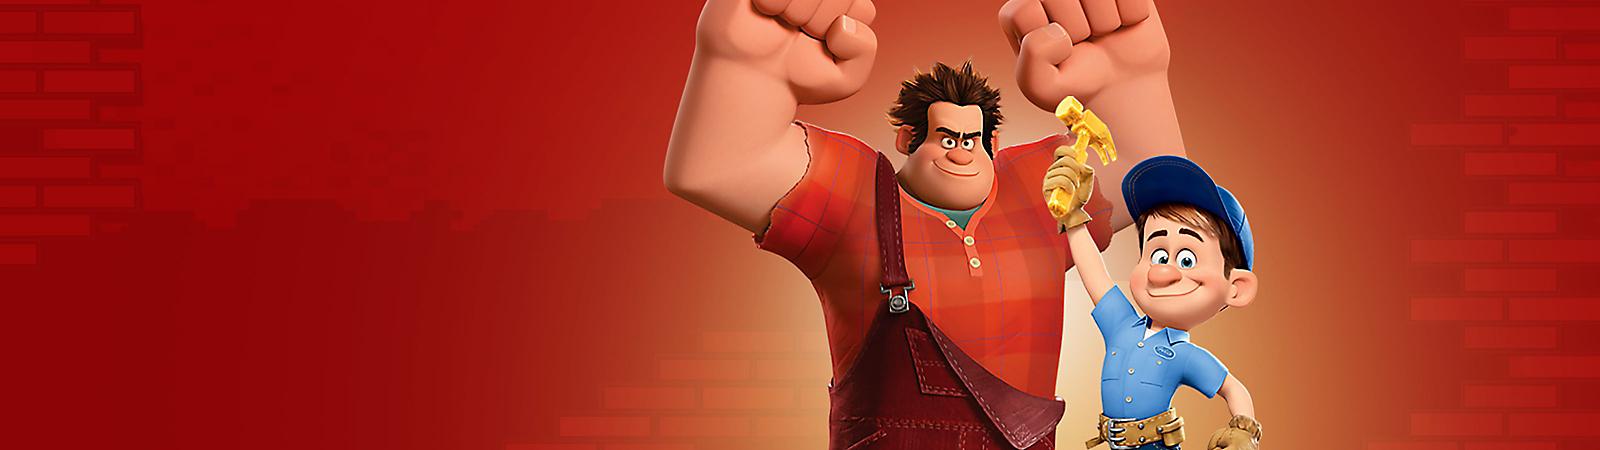 Wreck-It Ralph Breaks the Internet Princess Vanellope Disney Star Wars Necklace